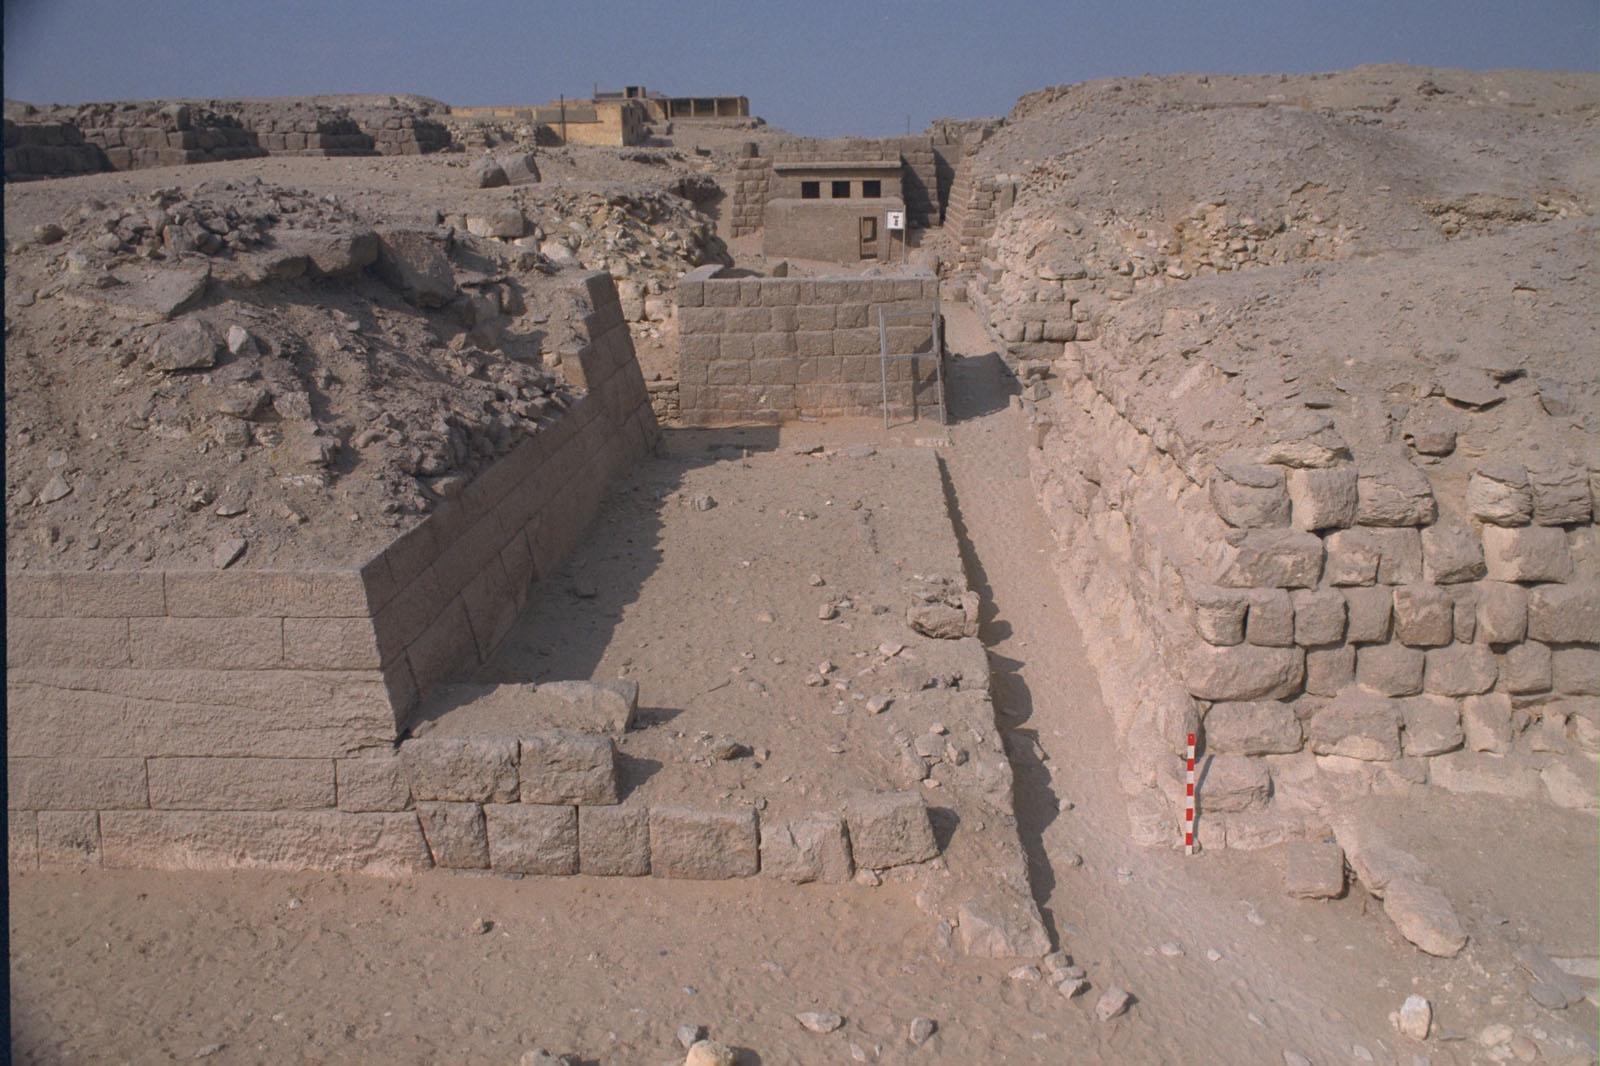 Western Cemetery: Site: Giza; View: G 2155, Kaninisut III (G 2156a), G 2160, G 2136, G 2100-II